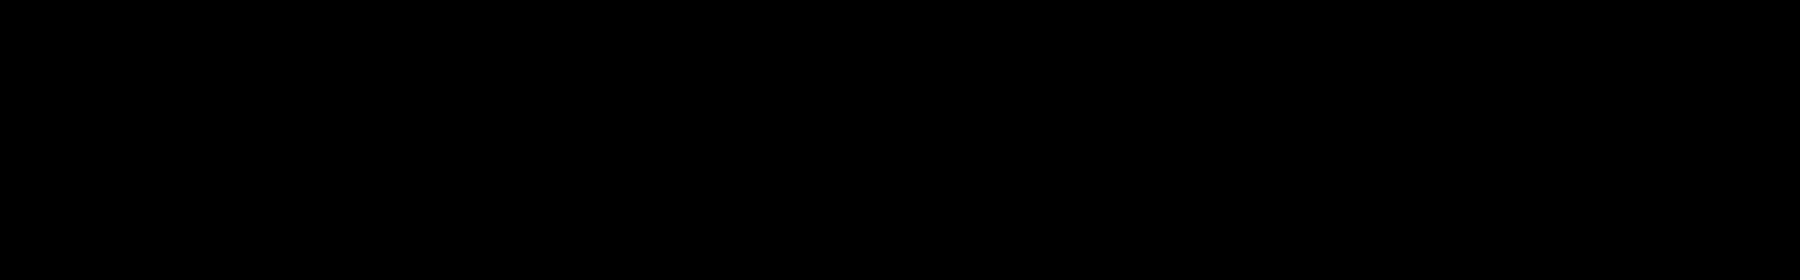 BIPOLAR MELODIC TECHNO audio waveform